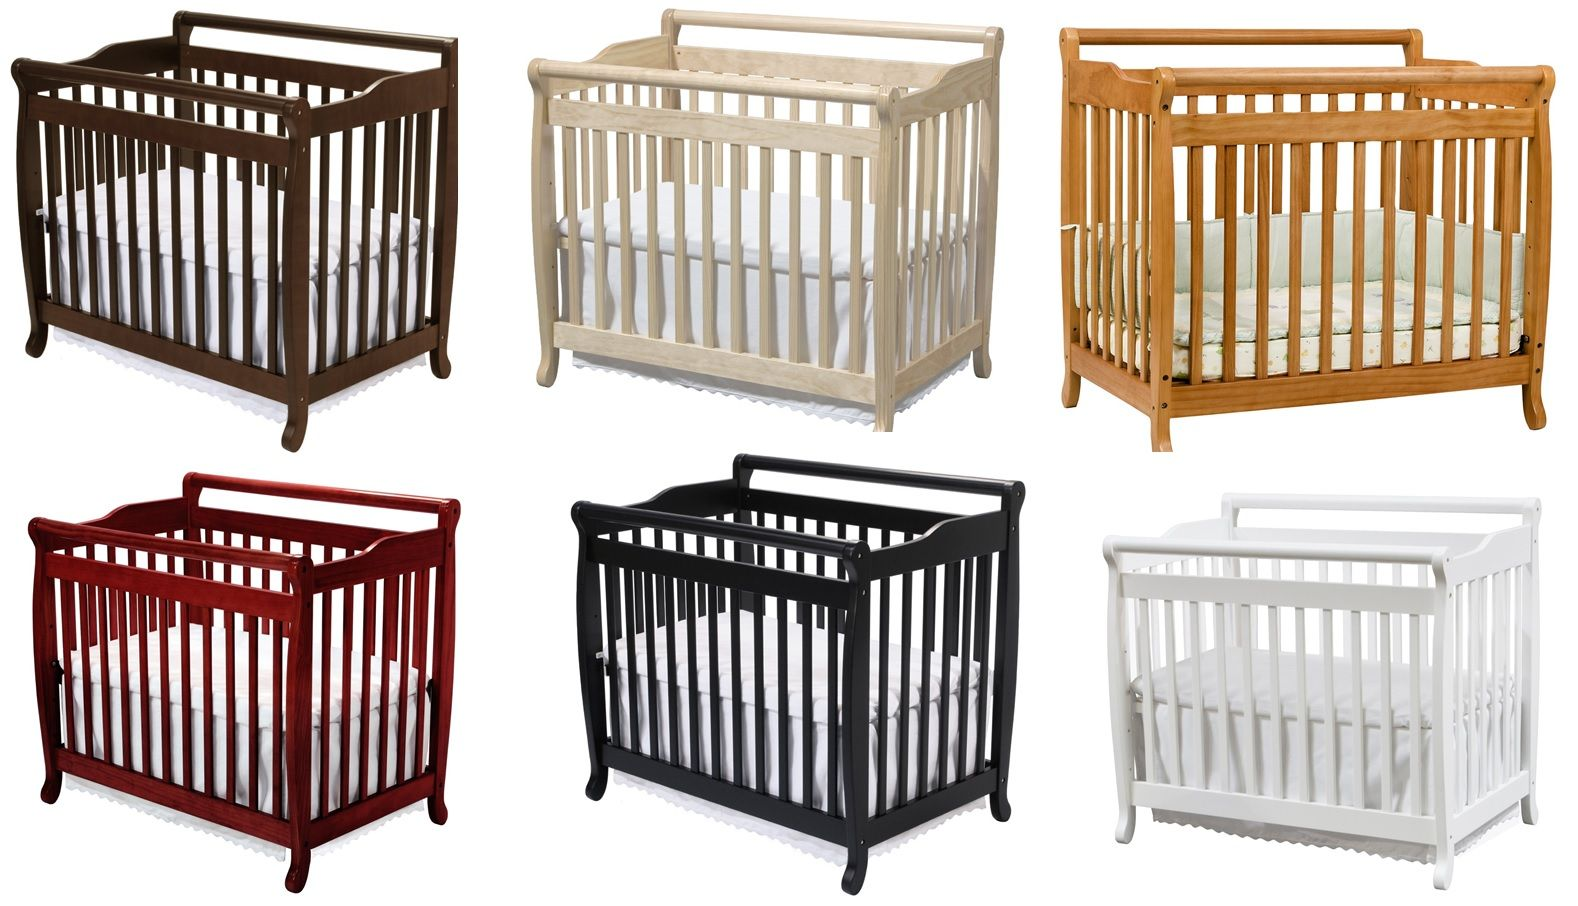 The DaVinci Emily Mini Crib is a small baby crib that is ...